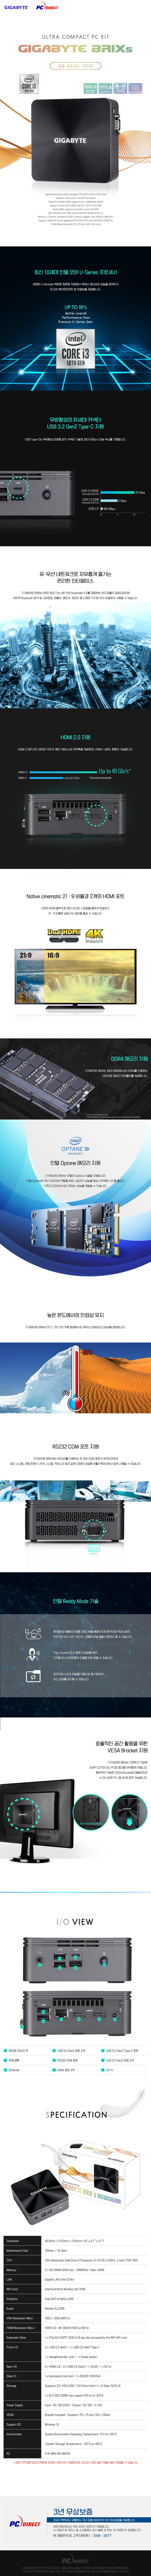 GIGABYTE BRIX GB-BRi3H-10110 M2 피씨디렉트 (8GB, M2 240GB)